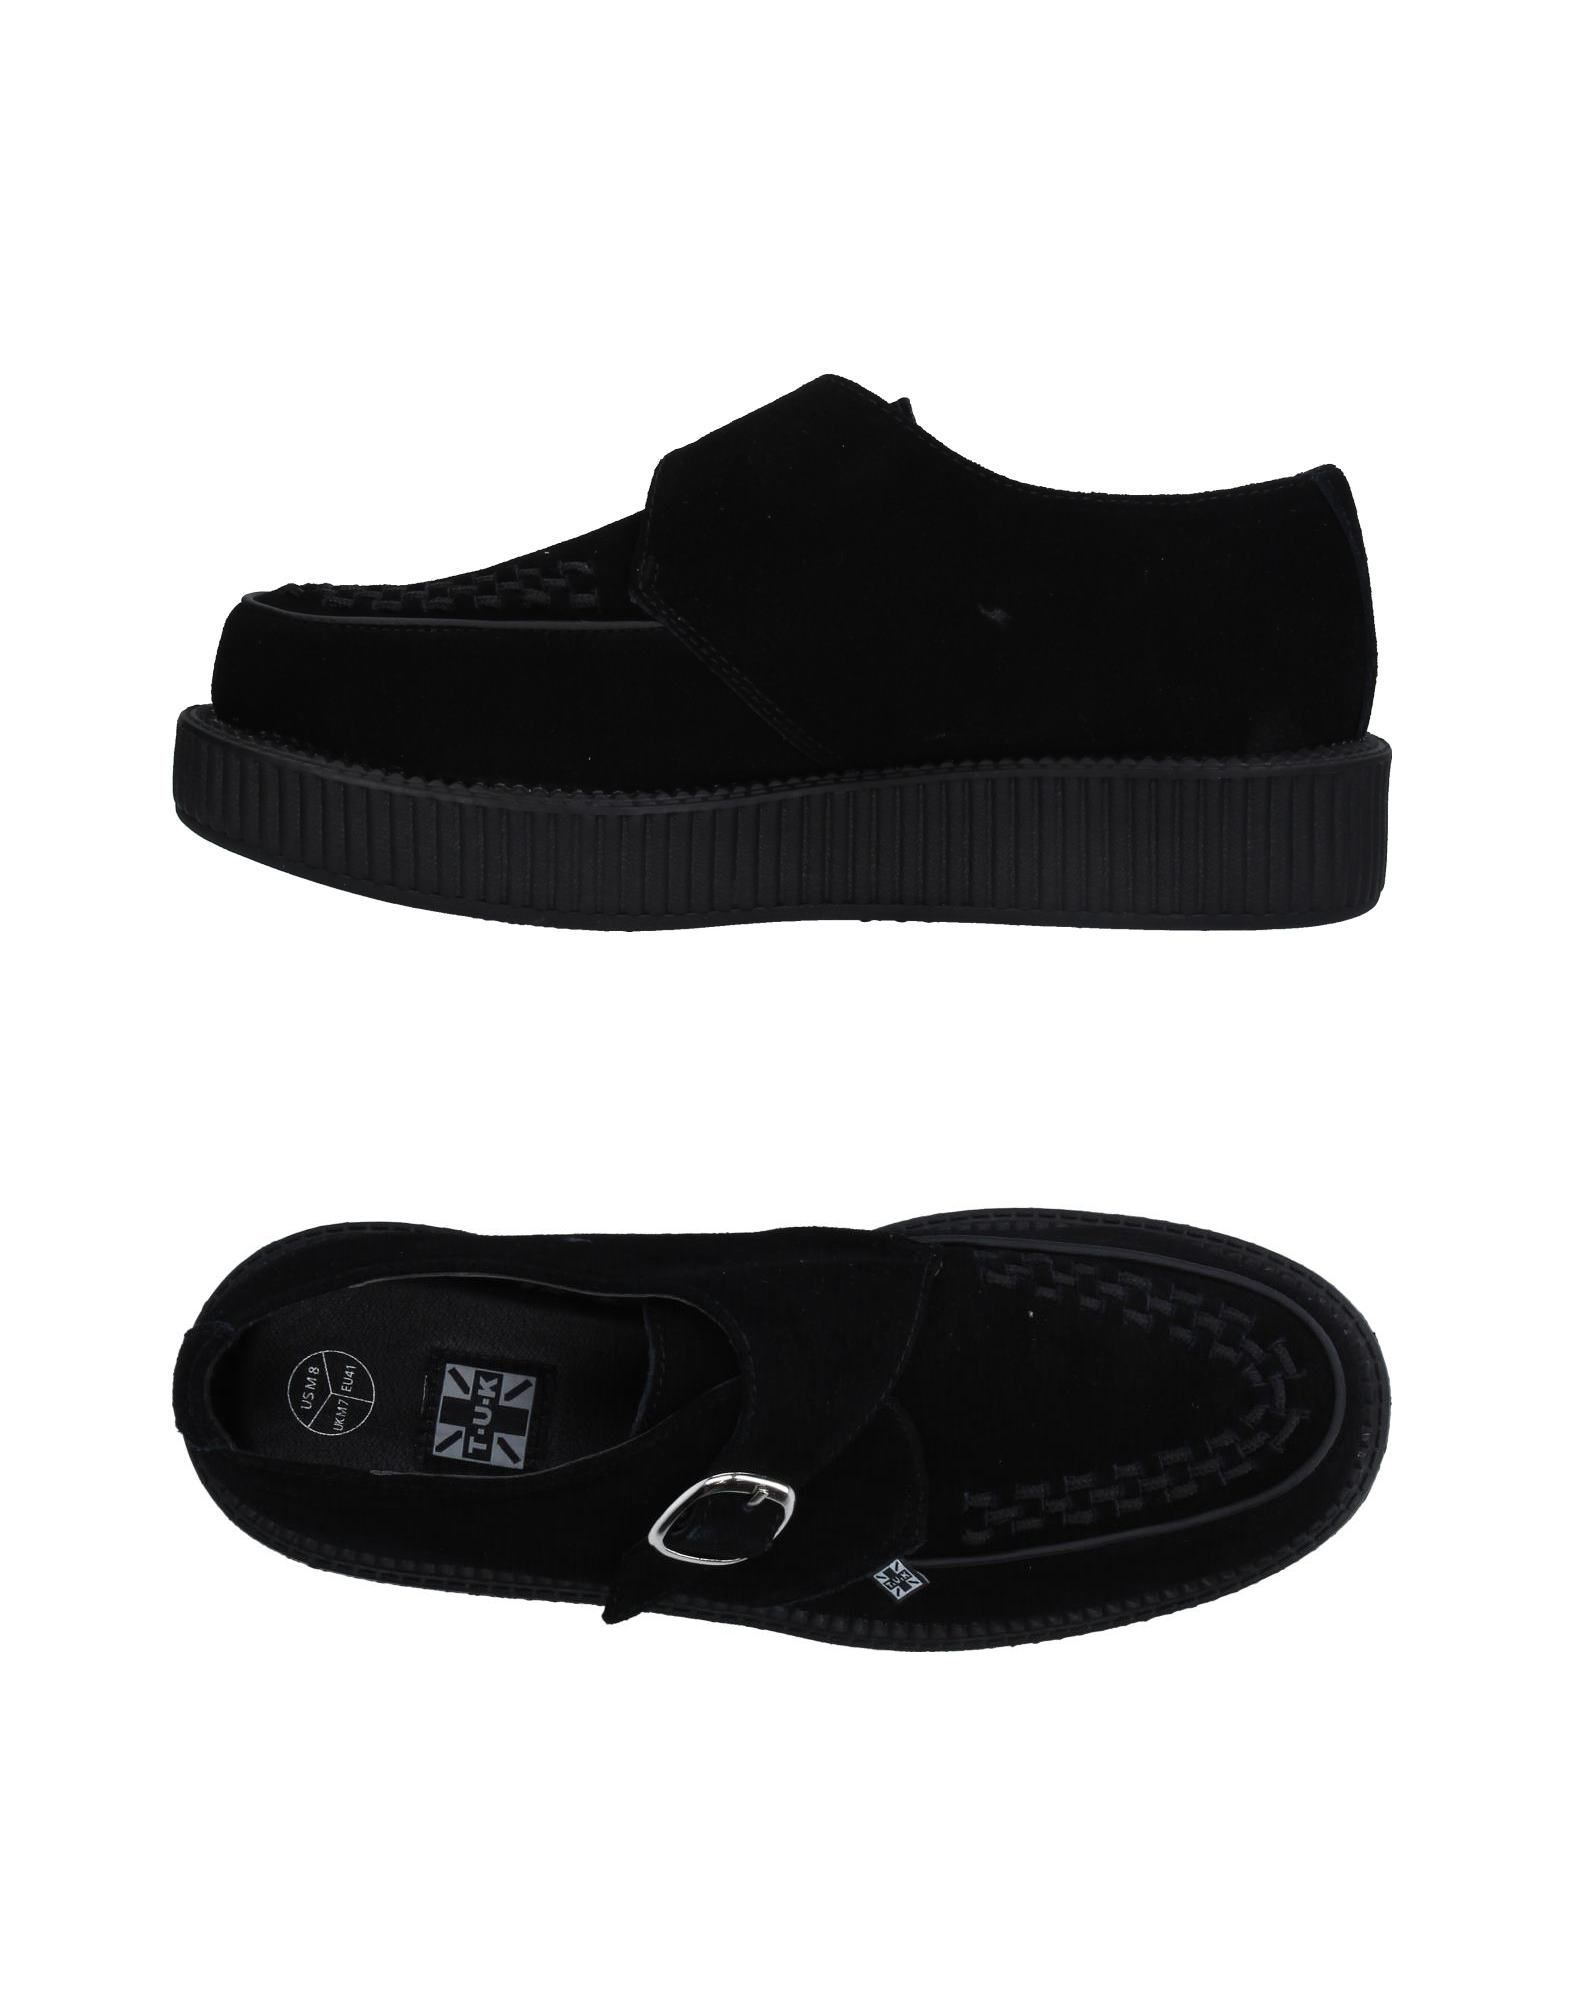 T.U.K Mokassins Damen Qualität  11273822IW Gute Qualität Damen beliebte Schuhe 97f9bc